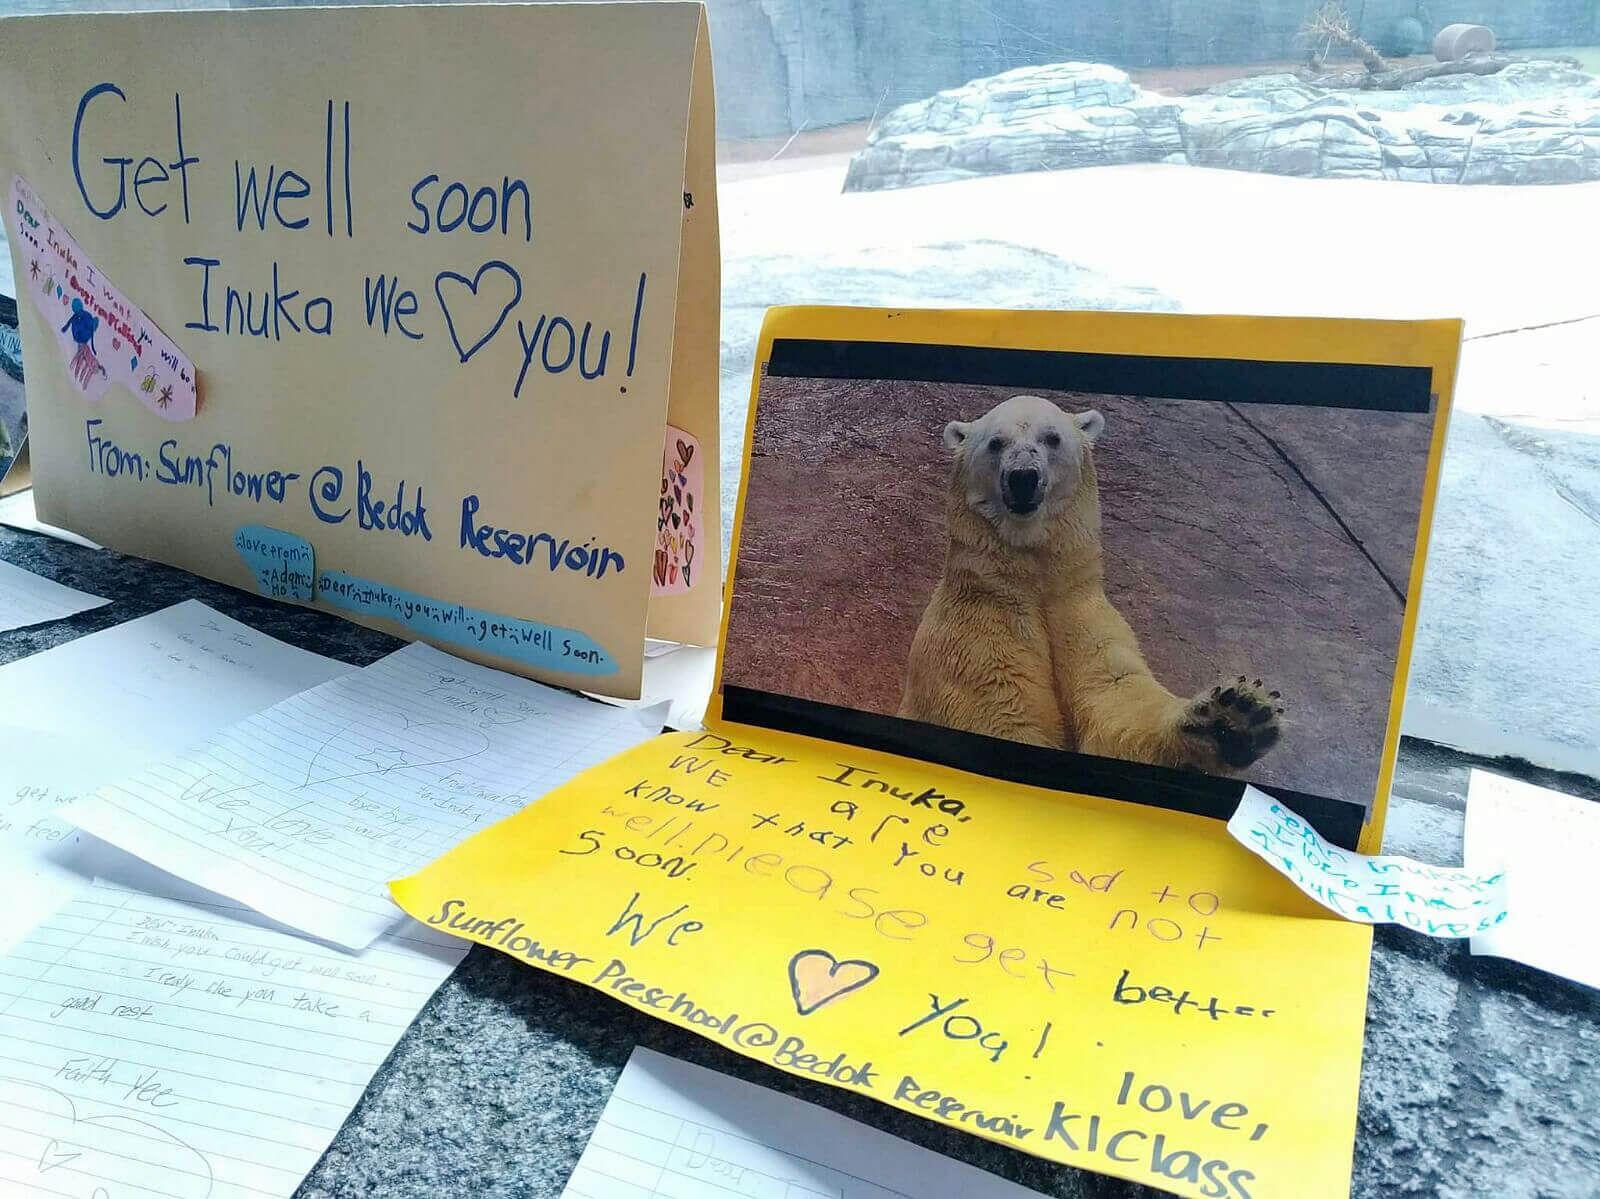 Singapore: Inuka, the first ever polar bear born in the tropics, dies